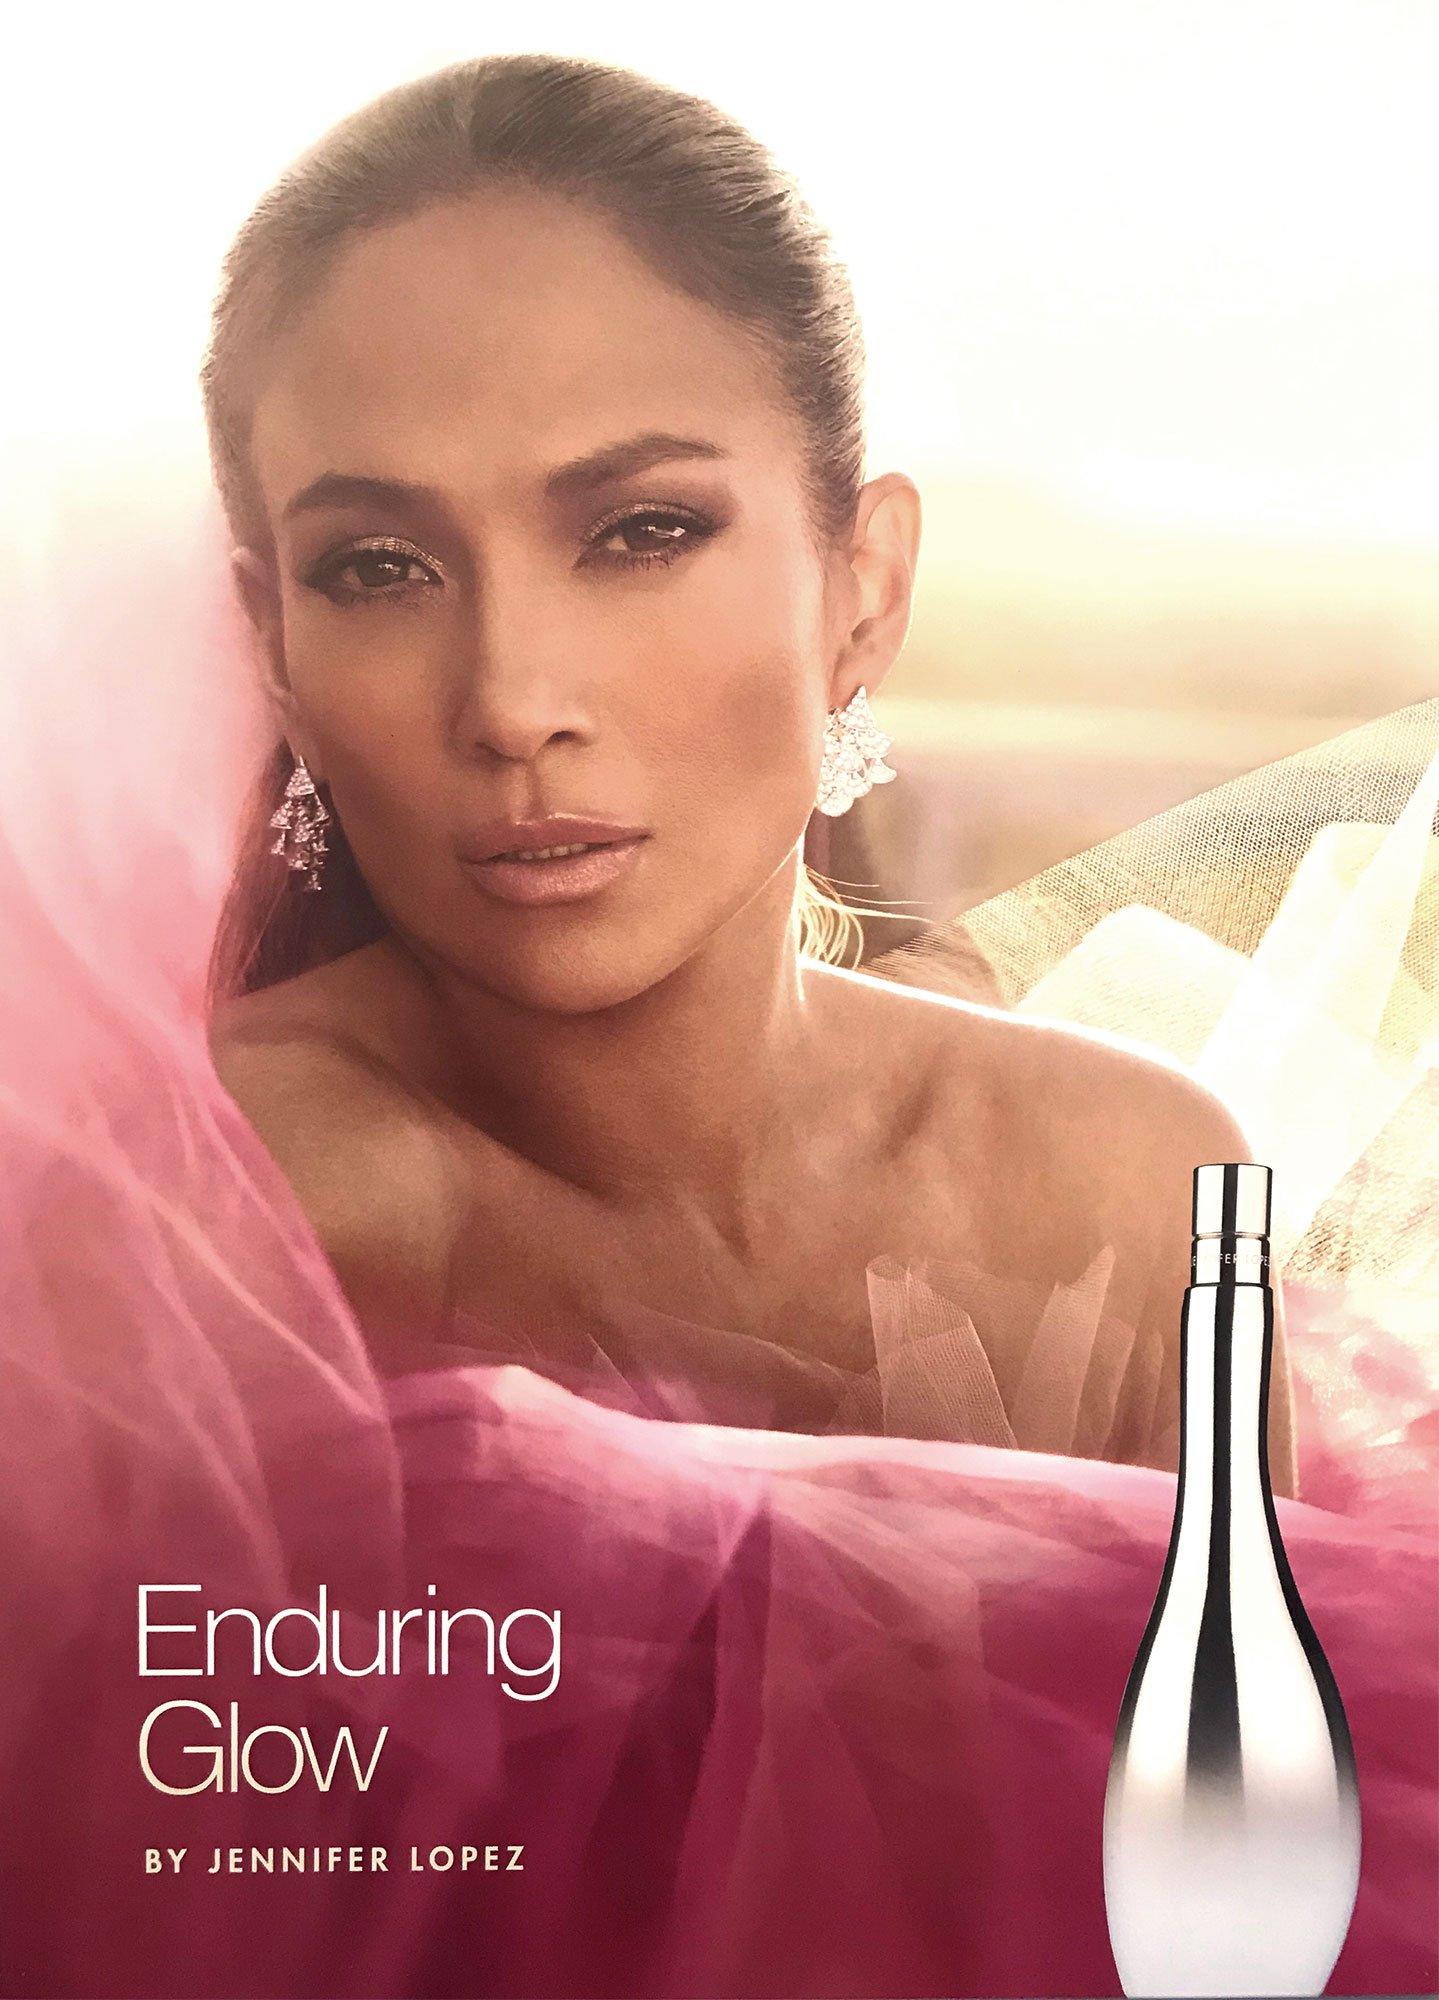 Jennifer Lopez Enduring Glow